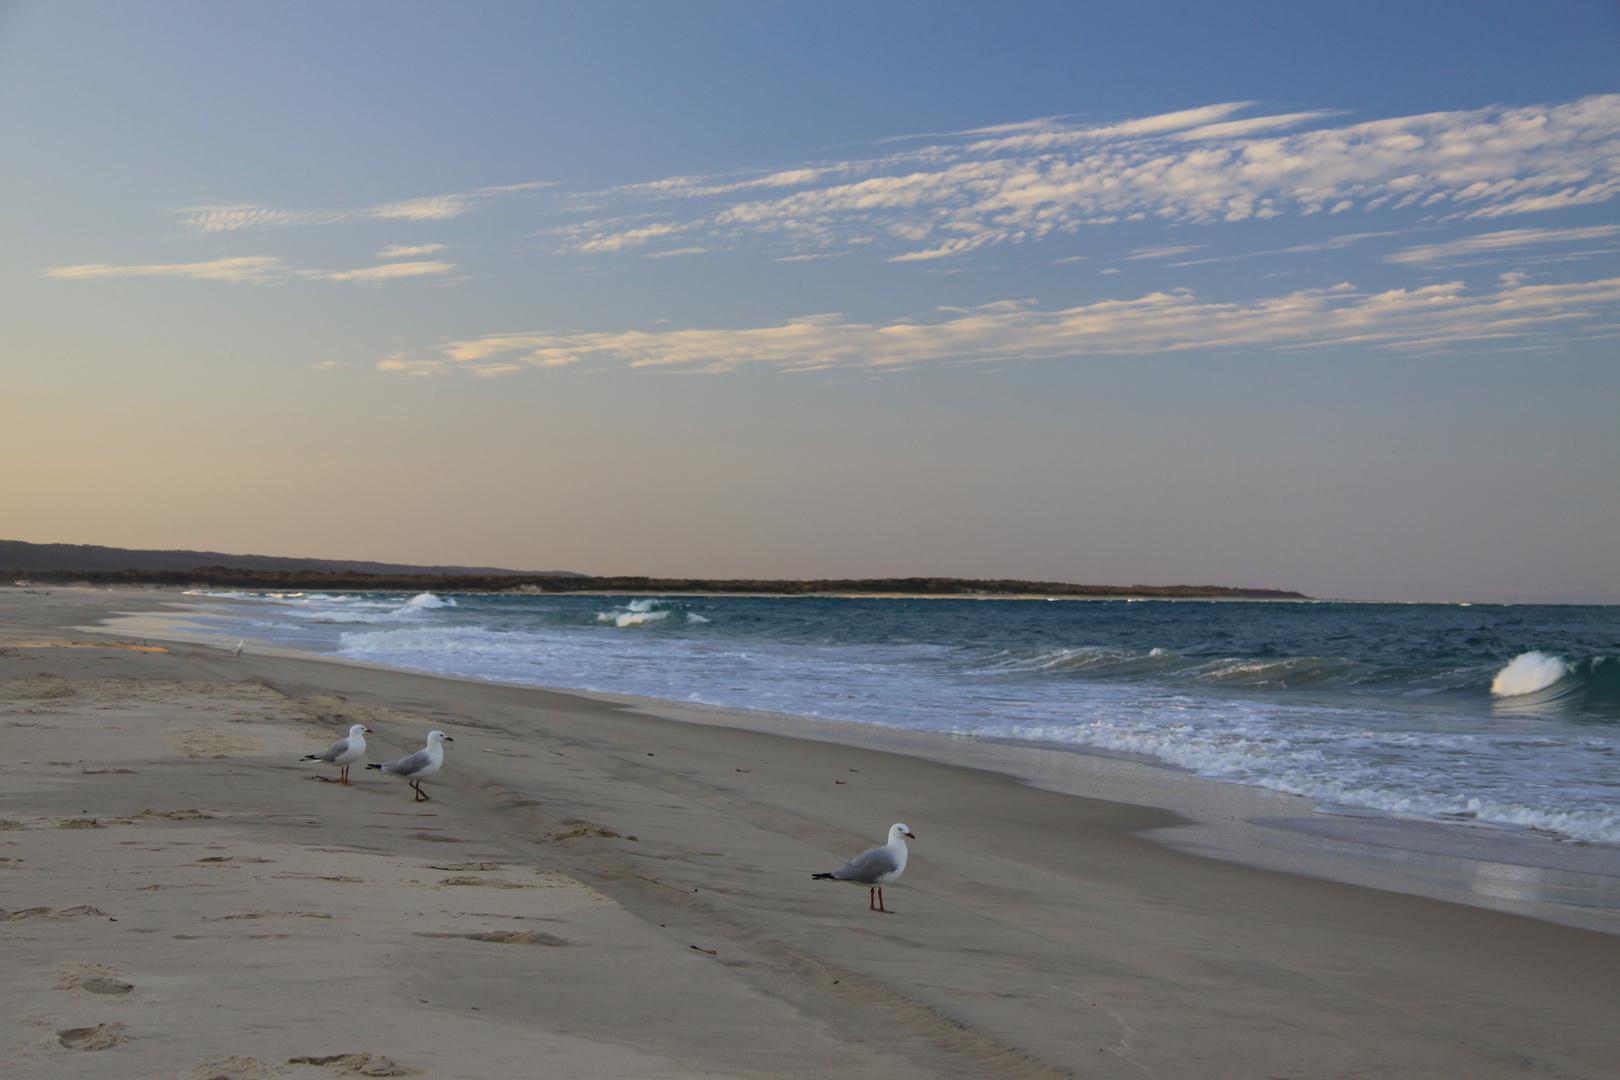 Strandabschnitt vor der Insel Fraser Island... - Australien, Queensland